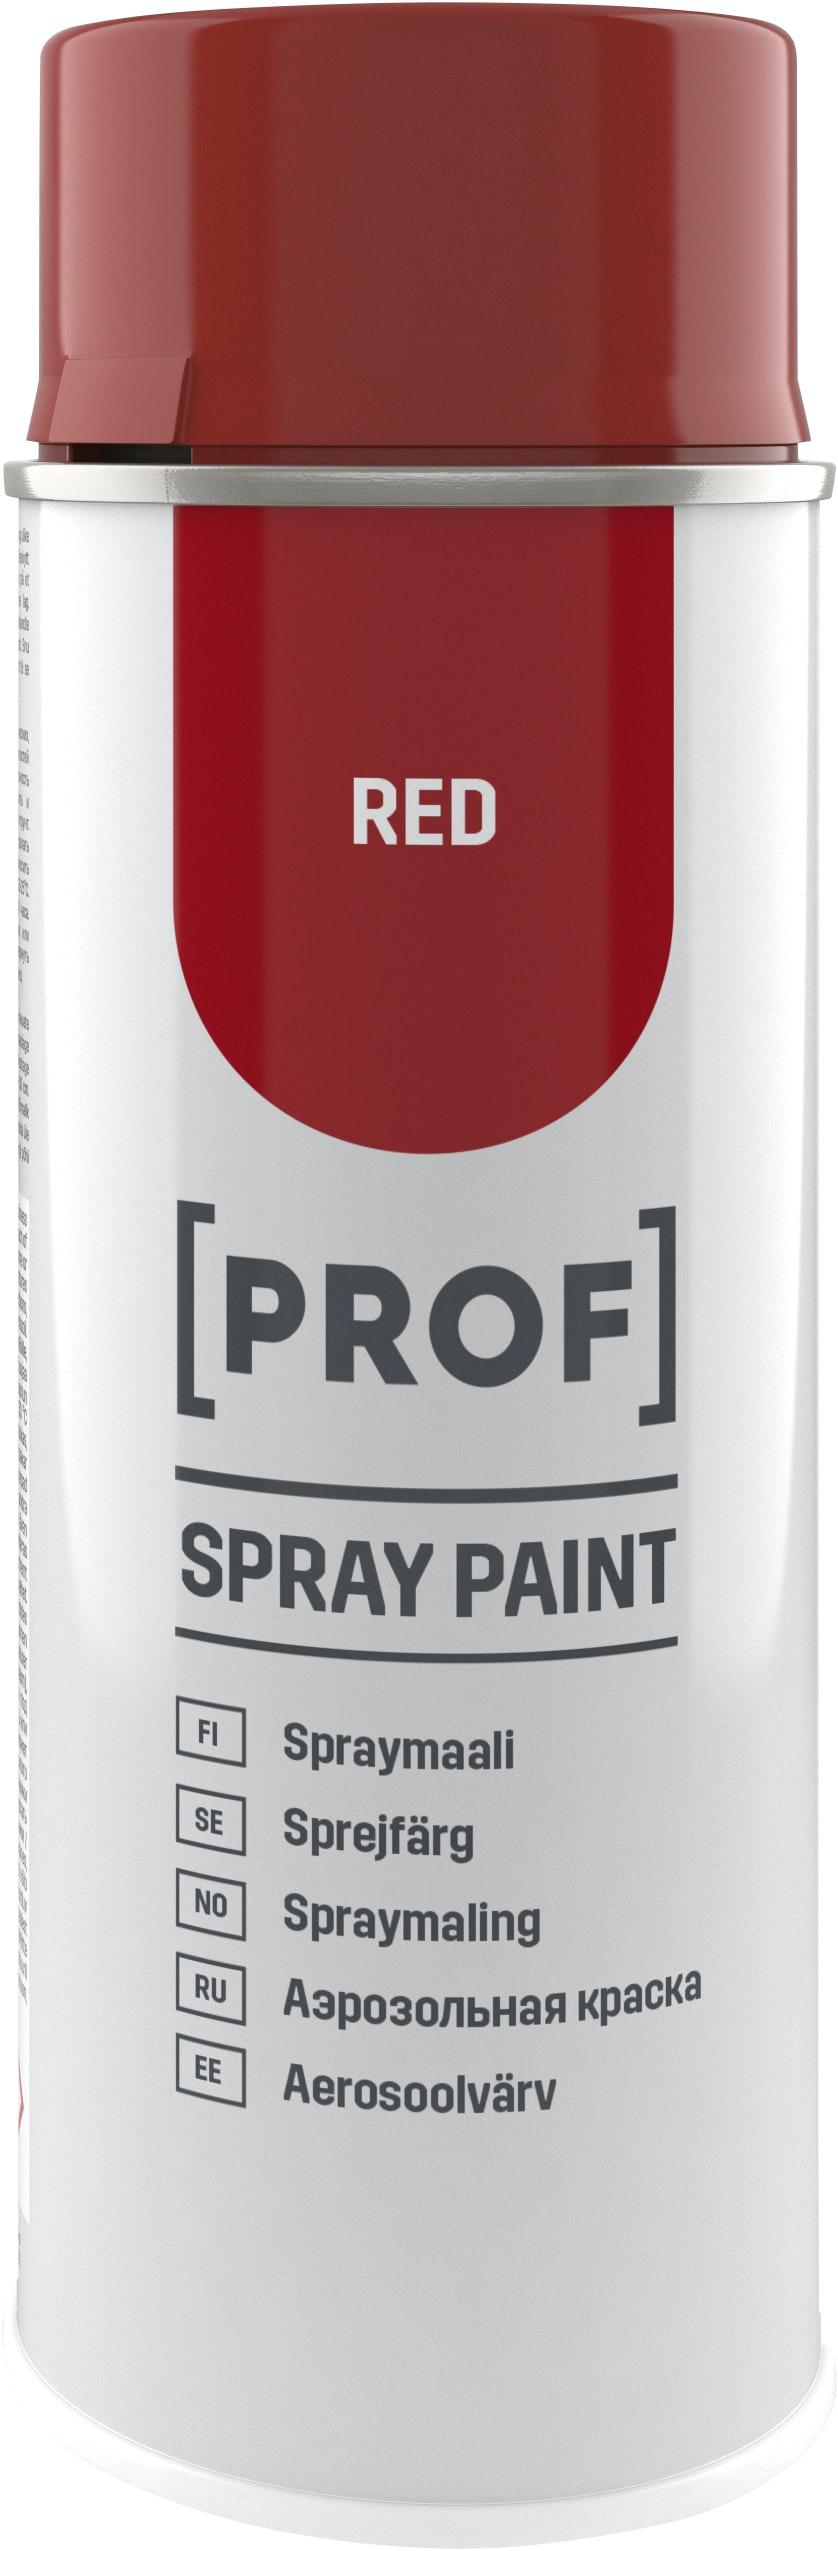 Sprayfärg Prof Professional Högblank Röd 400ml